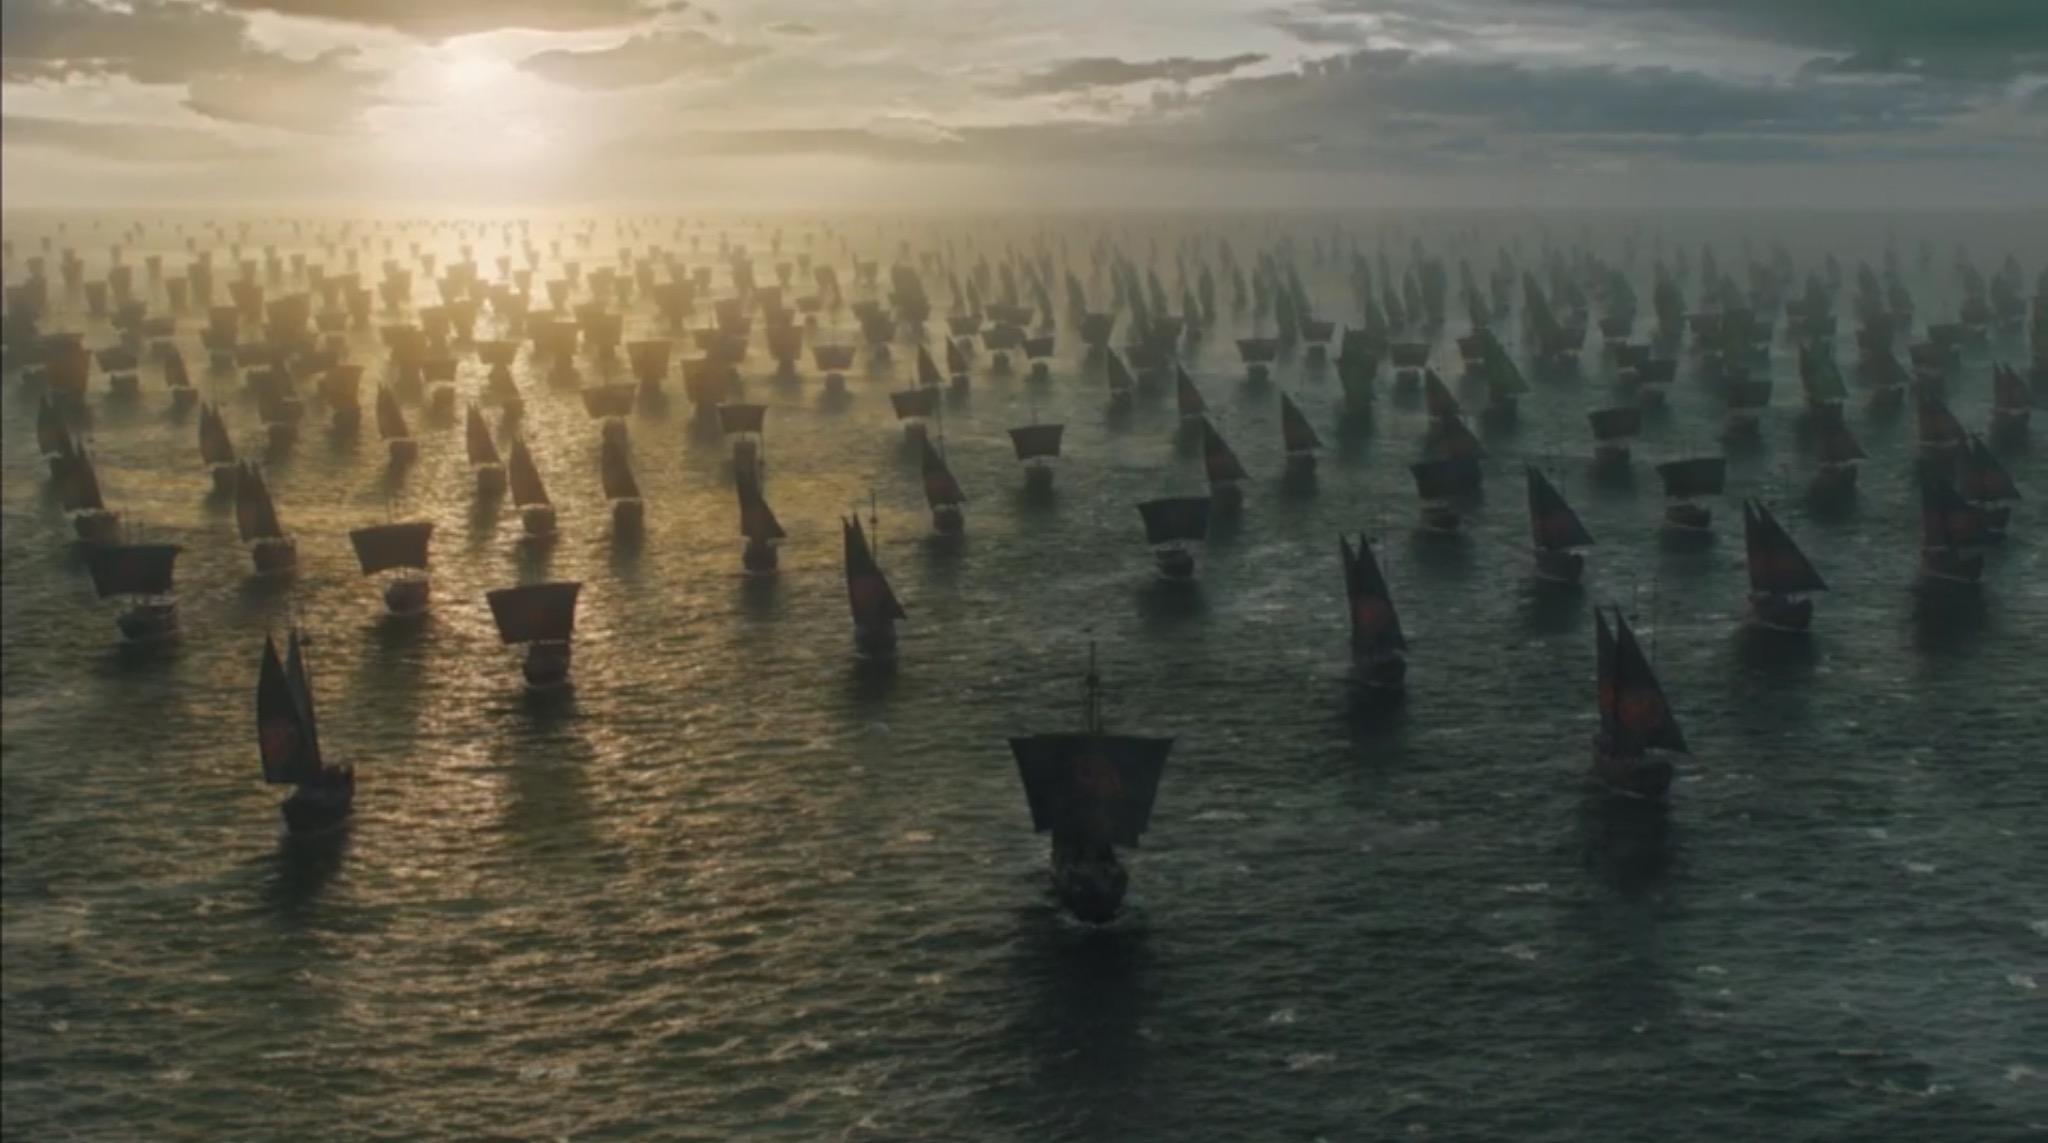 Game of Thrones season 6 finale teases season 7 plots: Where everyone's headed